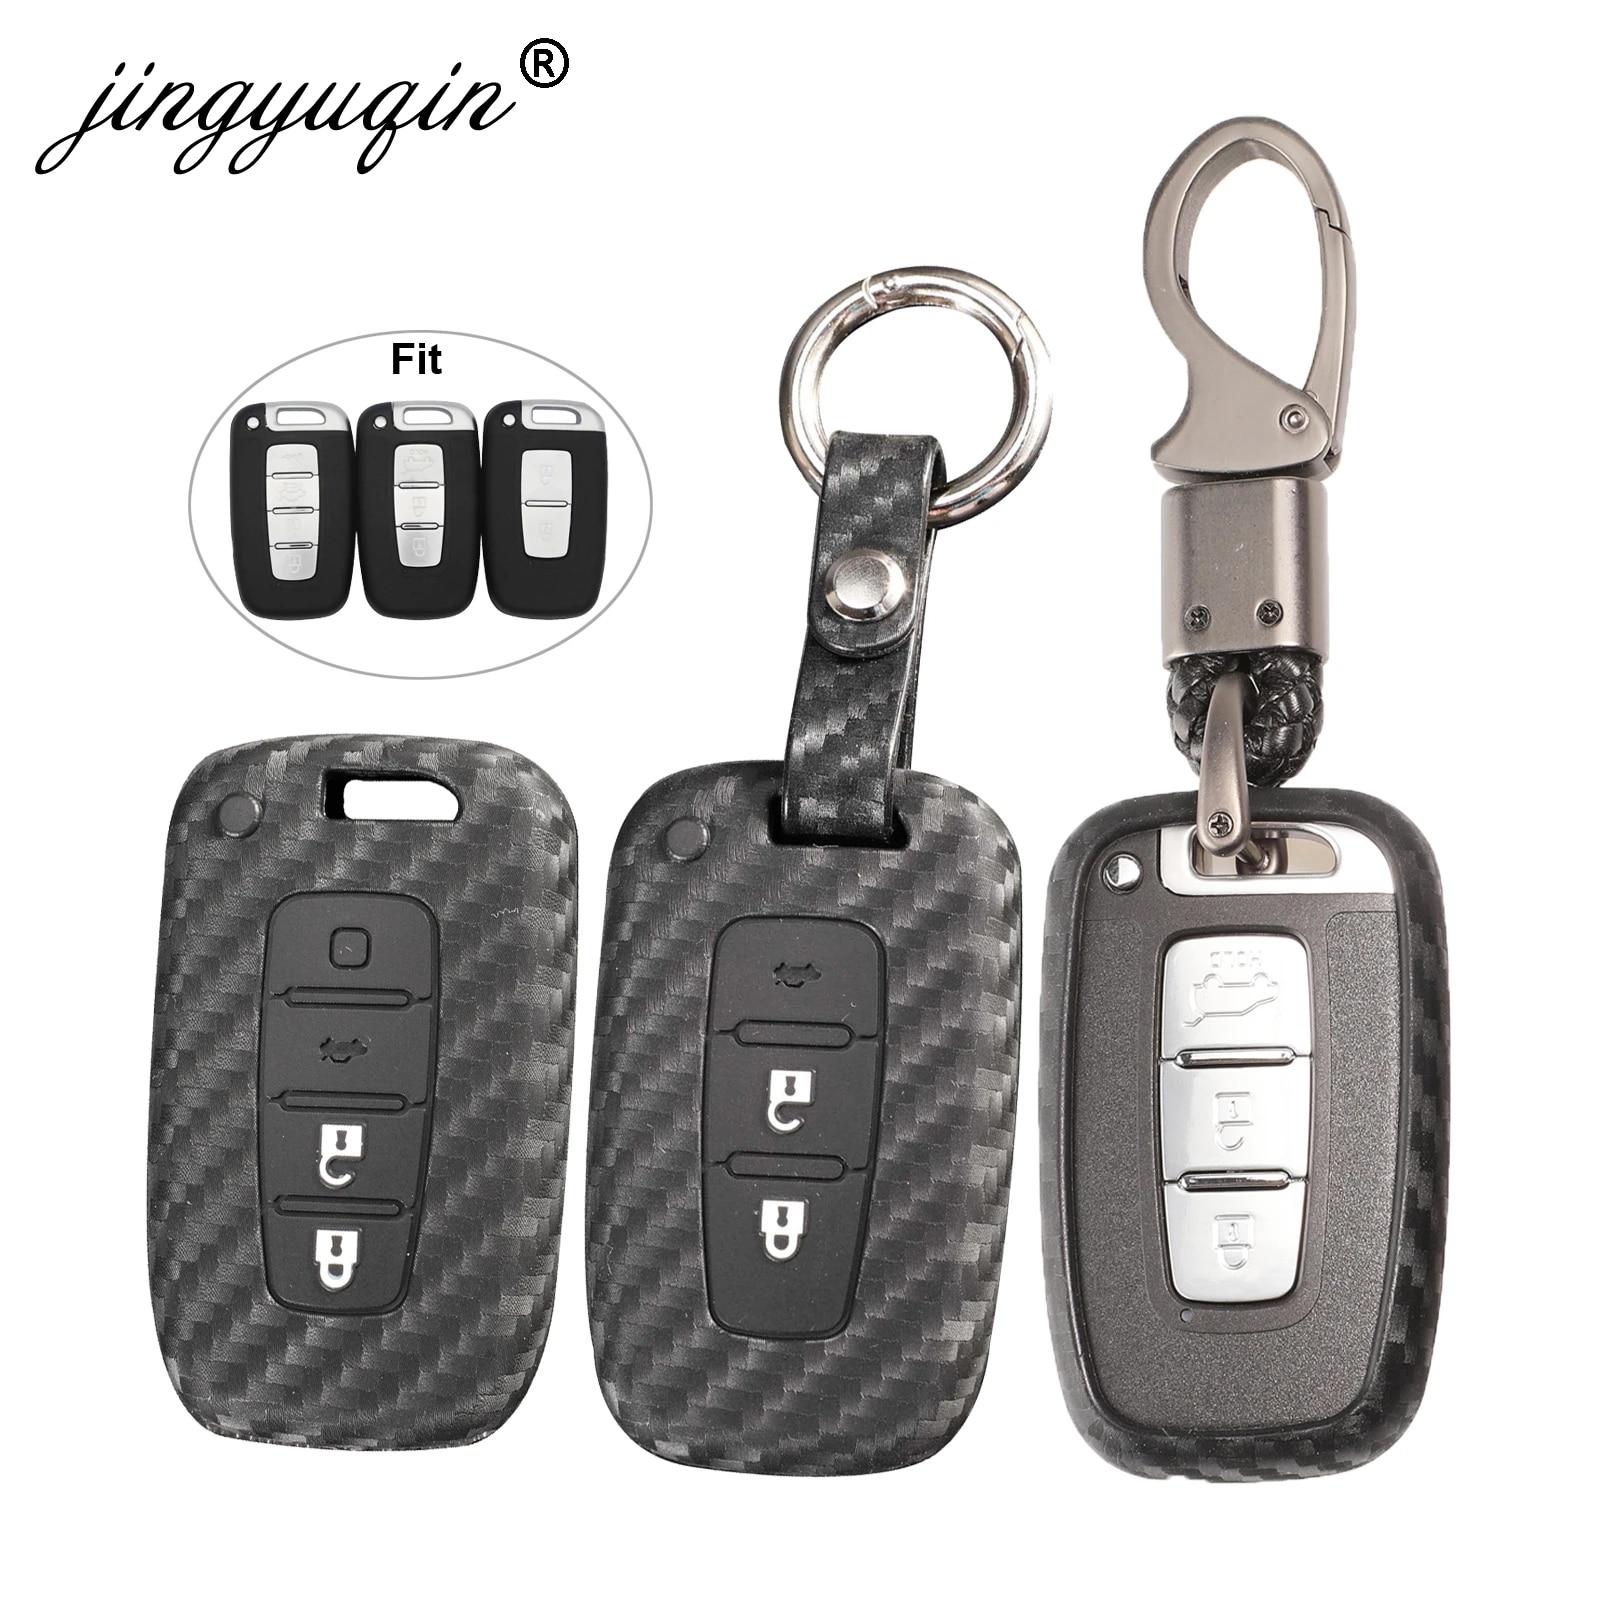 Hyundai flip Key Royalfox Black Silicone Carbon Fiber Style flip keyless Remote Key Fob case Cover for Kia K5 K2 Sportage Rondo Soul Rio Optima//Magentis//Lotze Hyundai Elantra Verna i20 i30 i35 TM